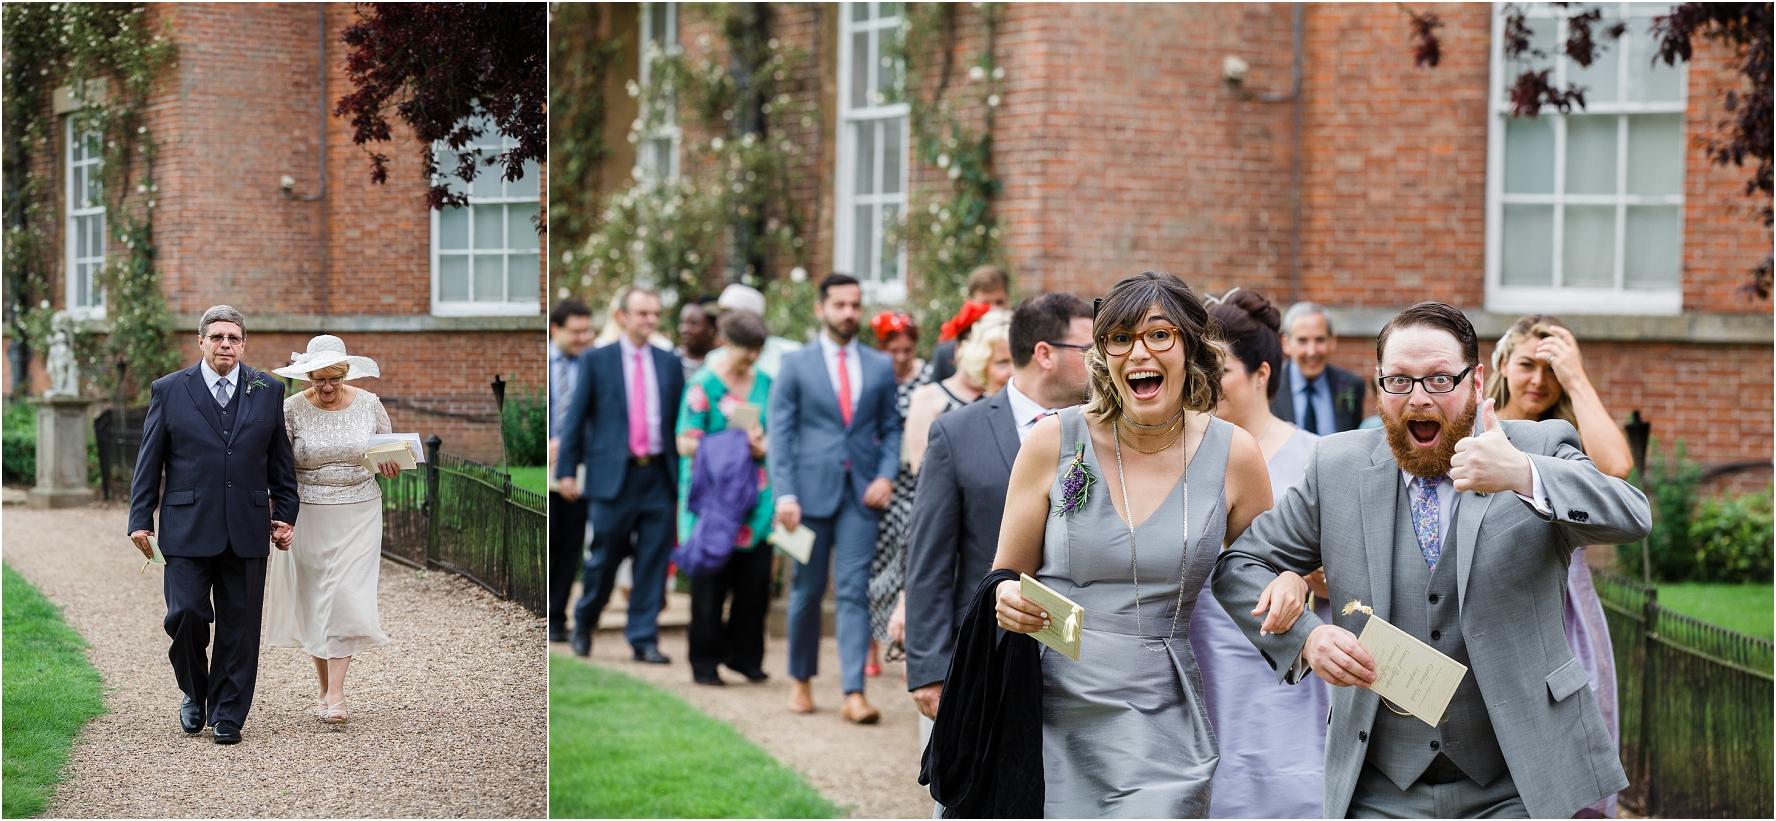 wedding-photography-the-orangery-settringham_0430